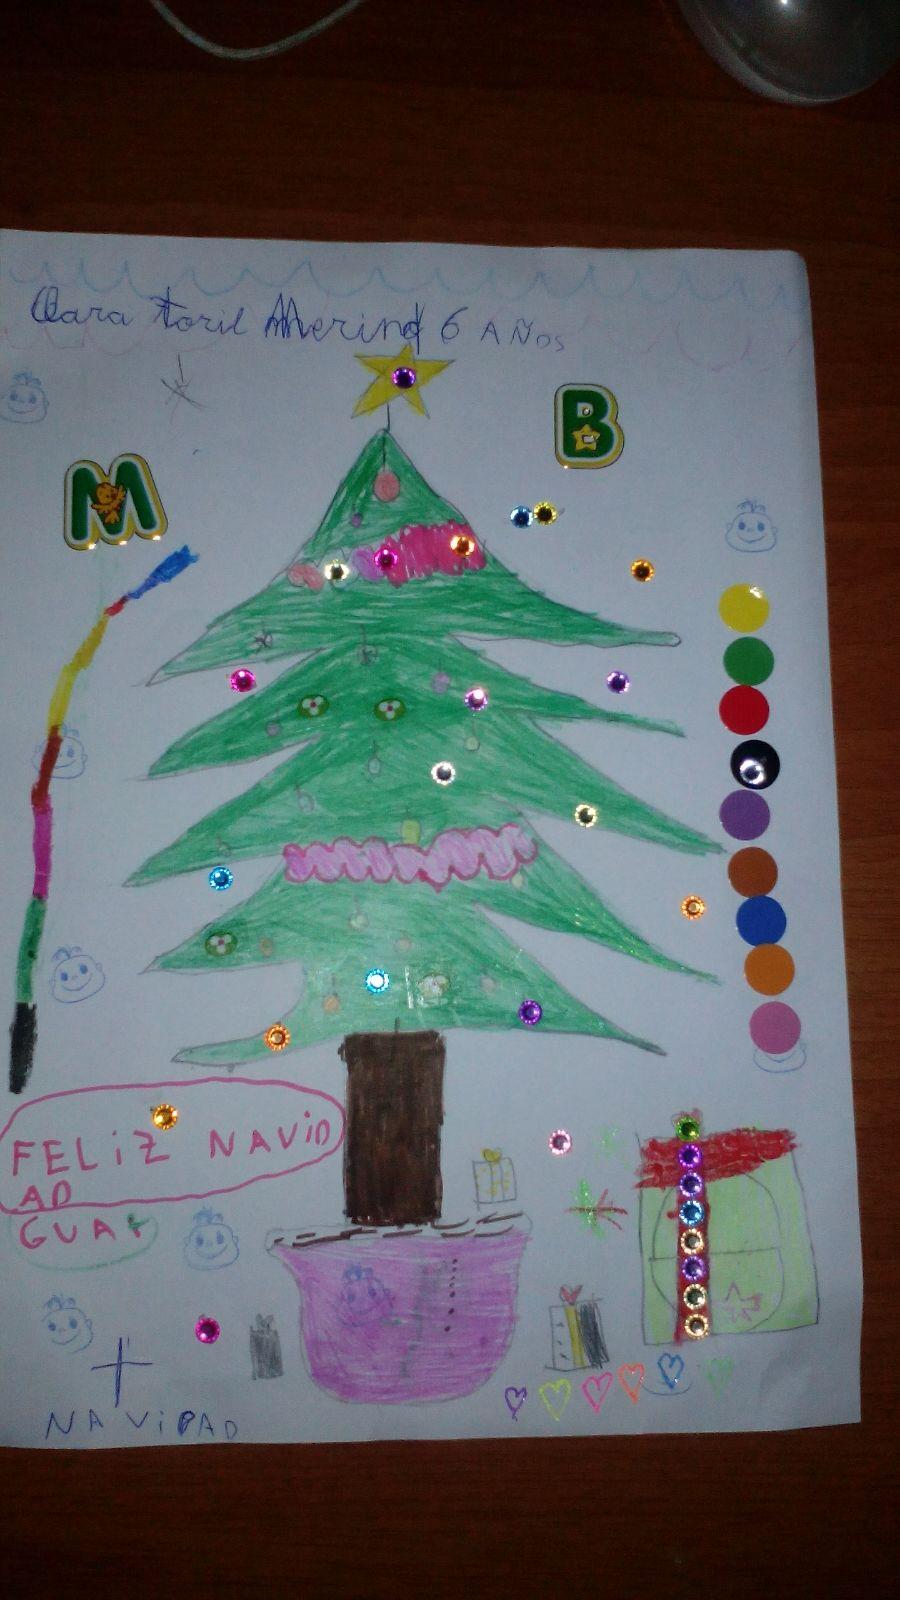 Clara Toril Merino (6 años)